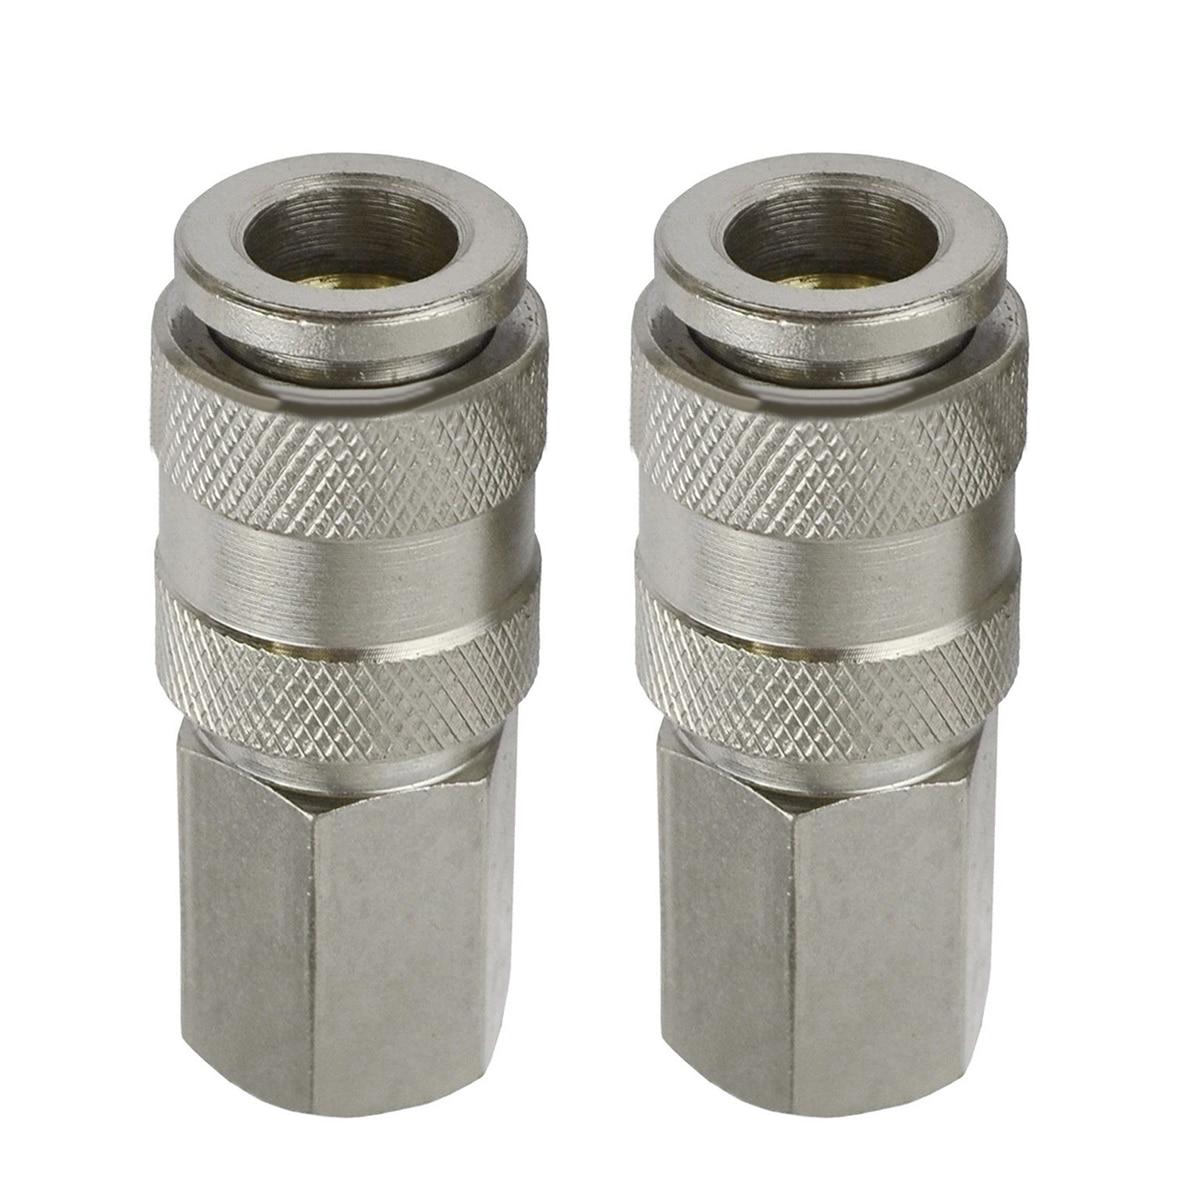 2pcs 1/4 BSP Euro Compressor Female Connectors Quick Release Air Line Hose  Connector Fitting